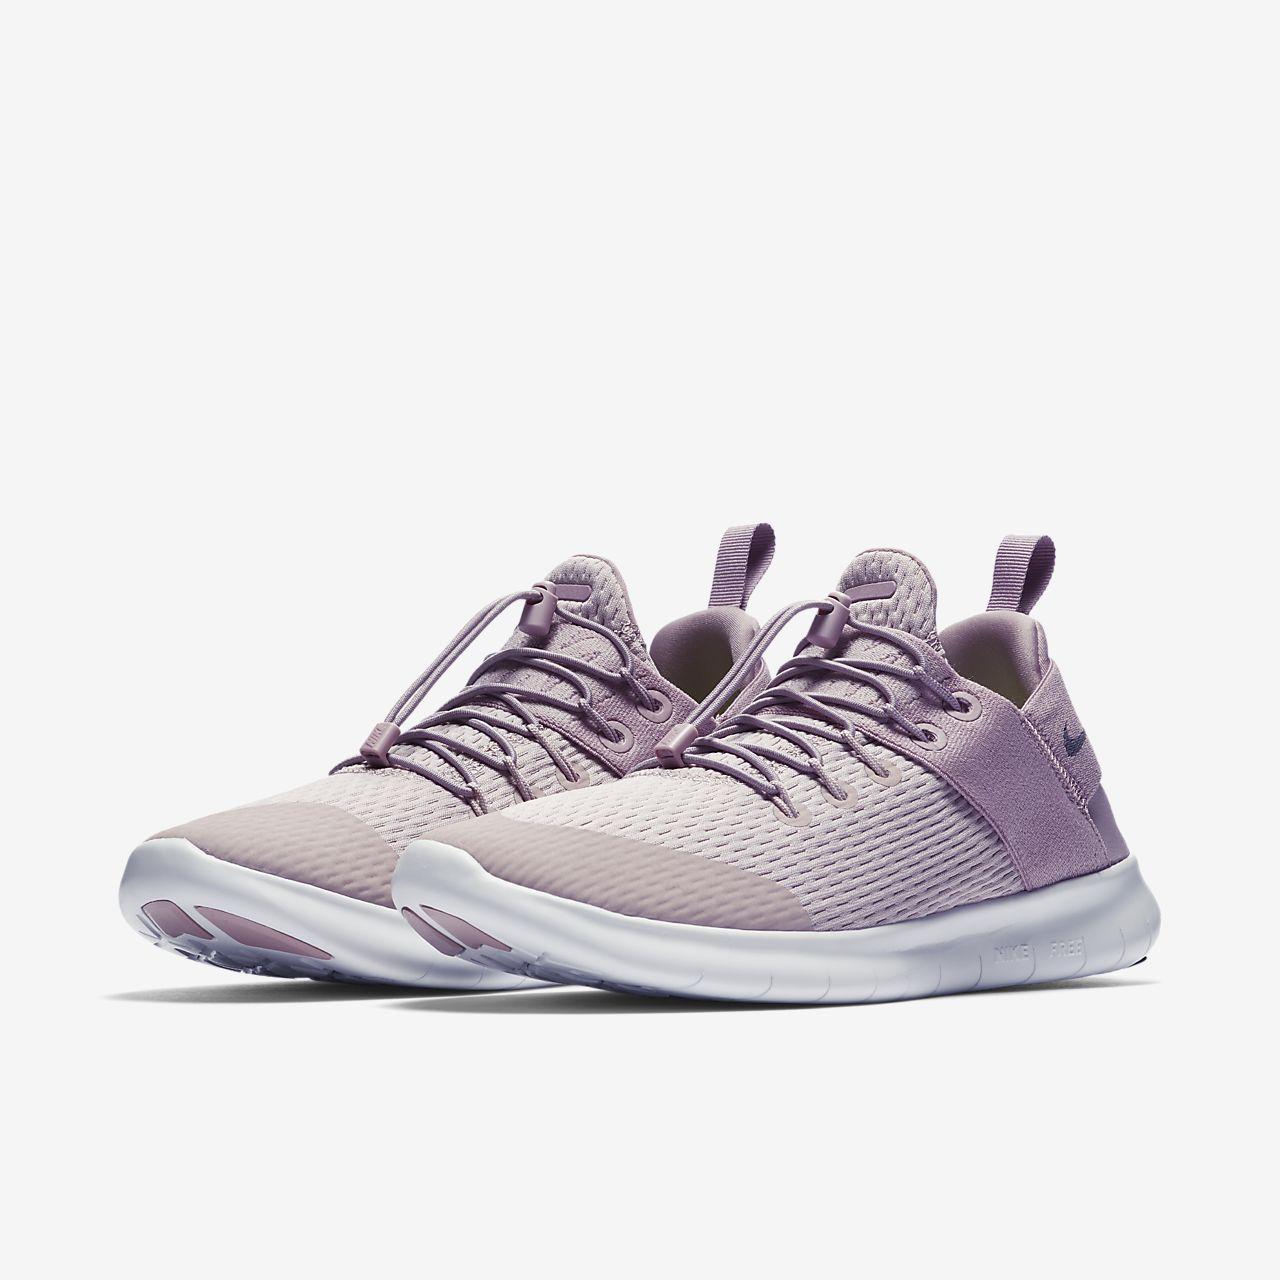 Nike Free Run Banlieue 2017 Hardloopschoen 1eV9DEY